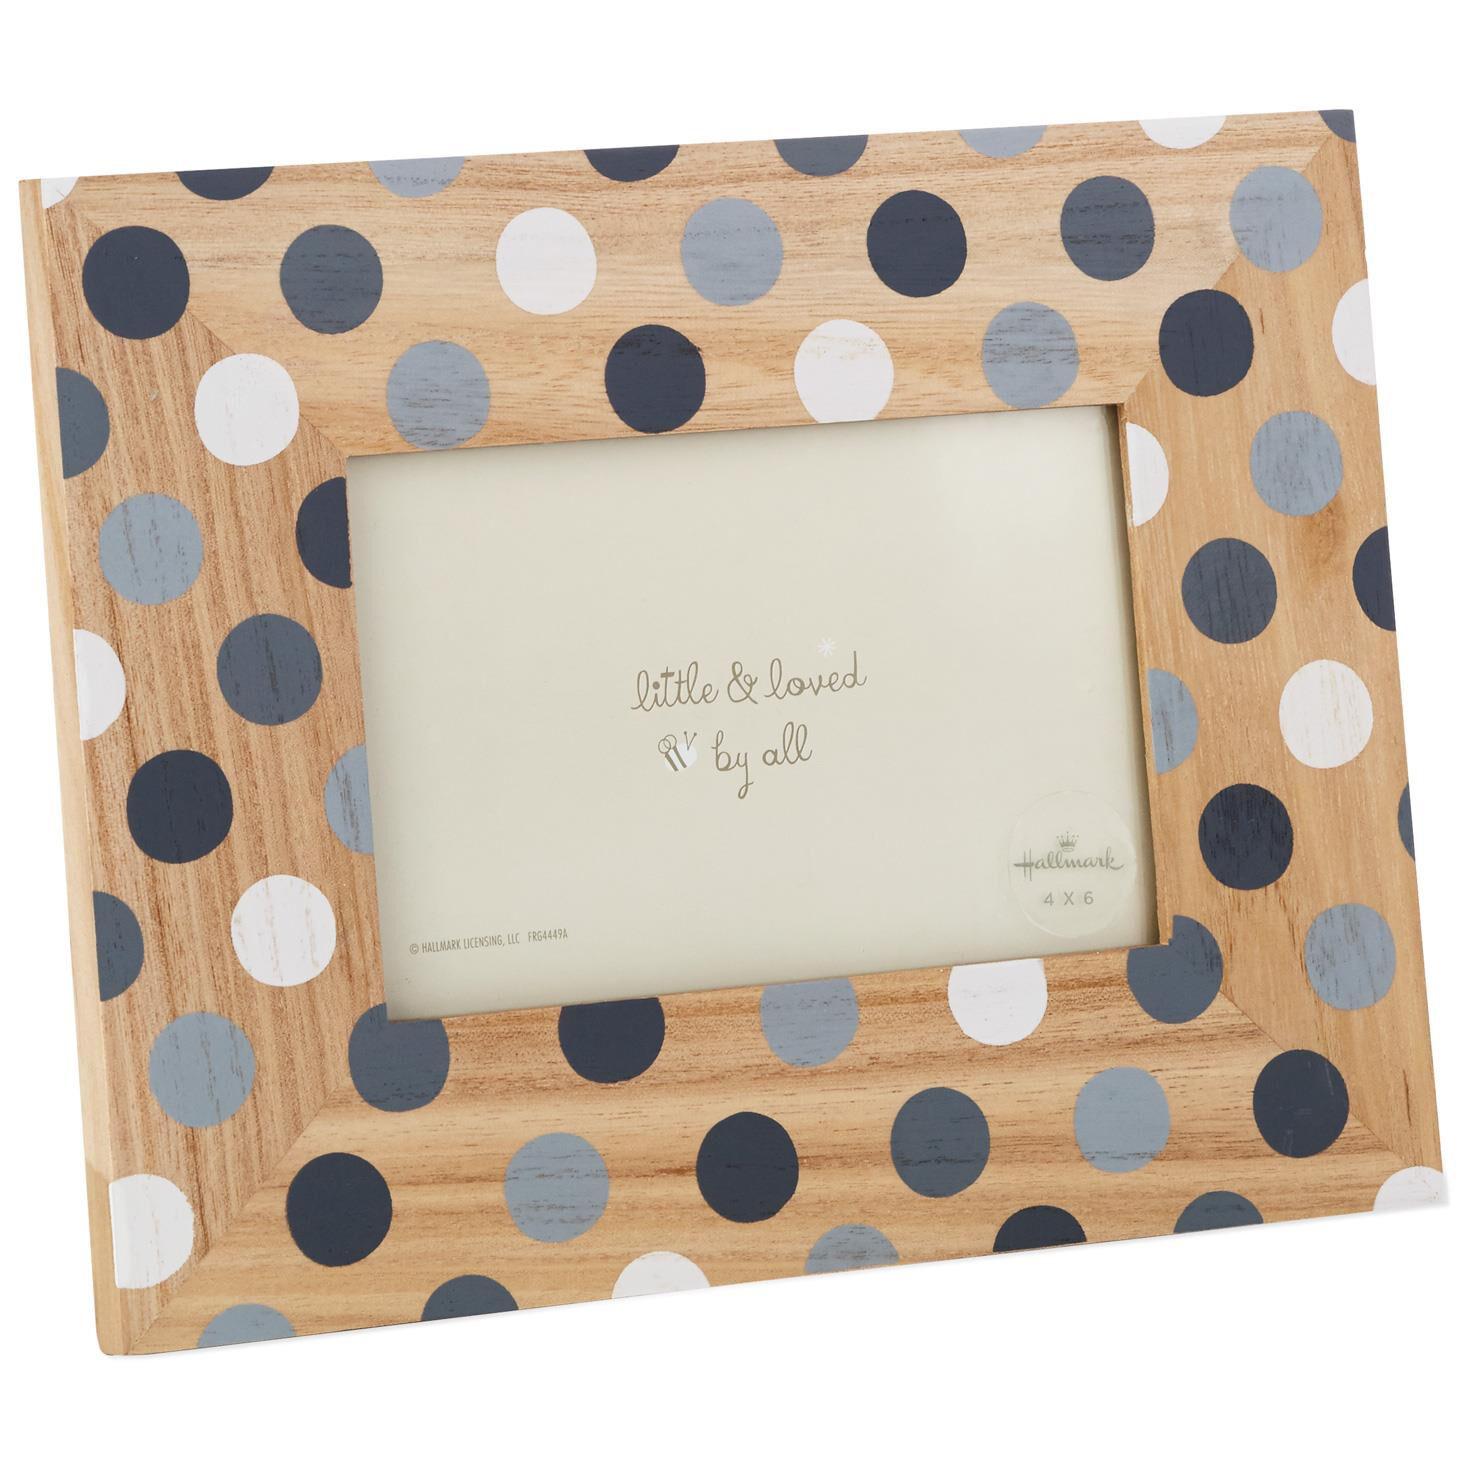 Grey Polka Dot Picture Frame, 4x6 - Picture Frames - Hallmark